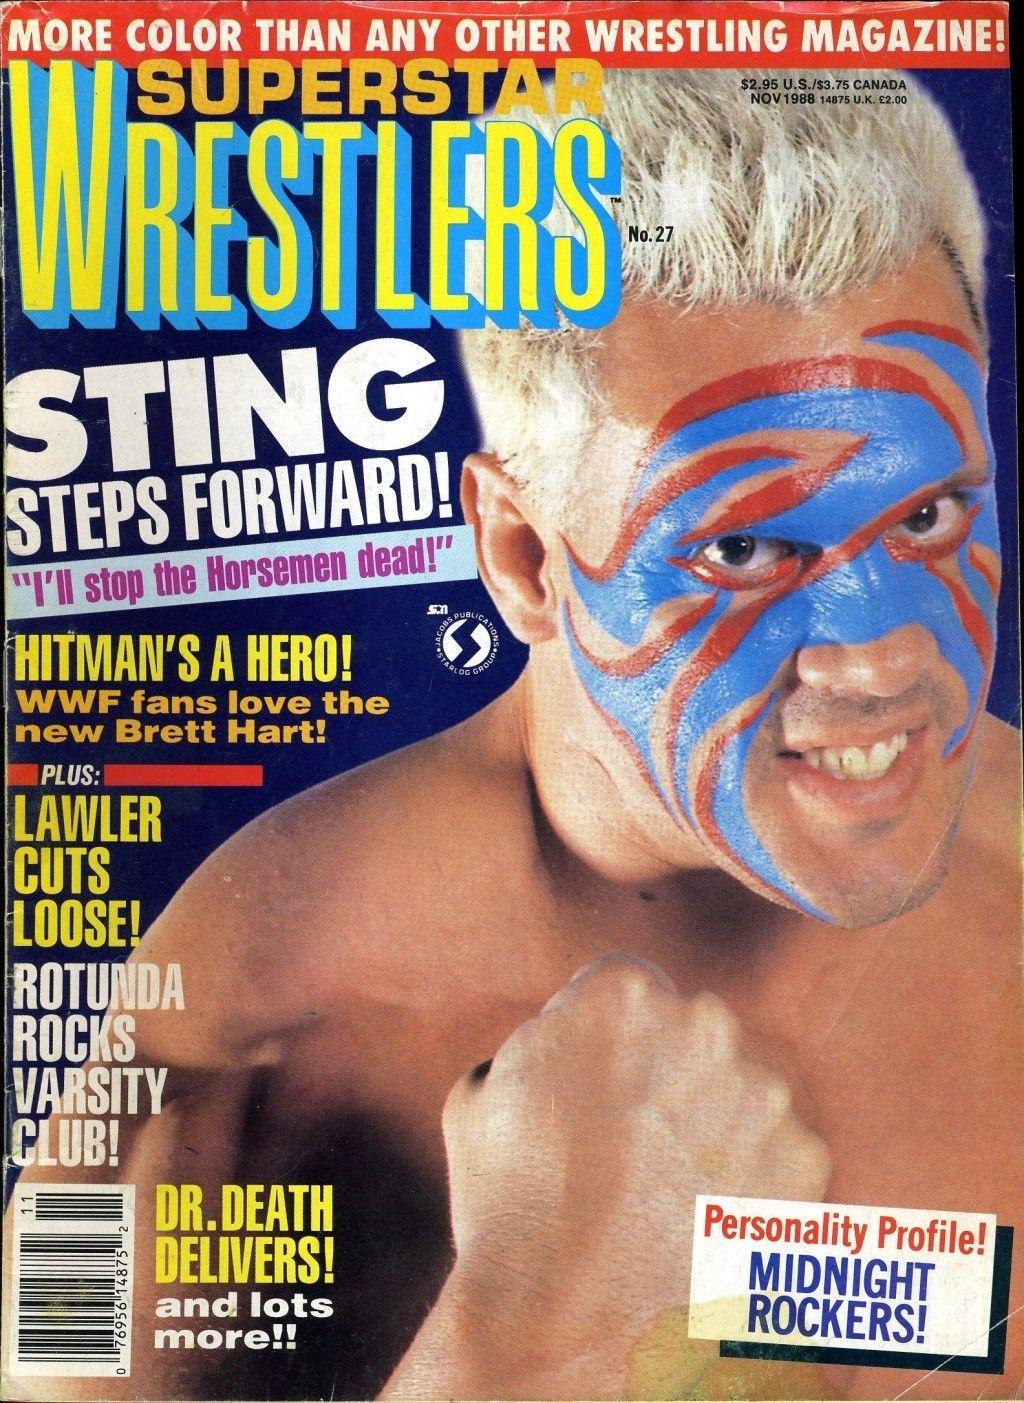 Superstar Wrestlers - November 1988